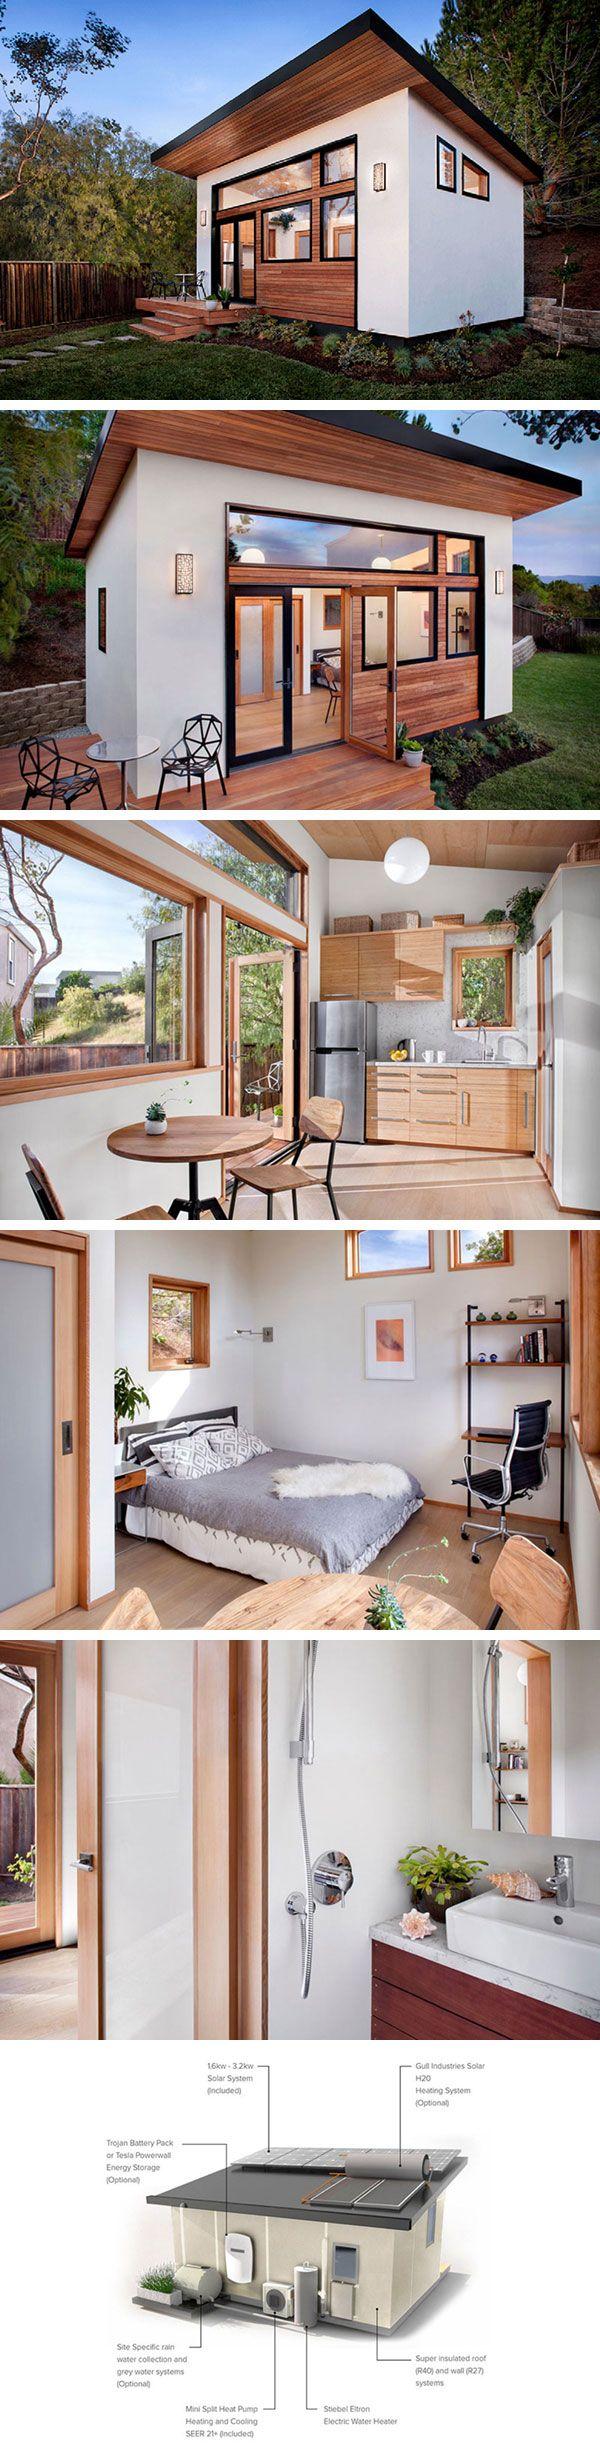 Модульный дом Britespace от Avava Systems  #tinyhomesdigest #tinyhouse #ecohouse #smallhouse